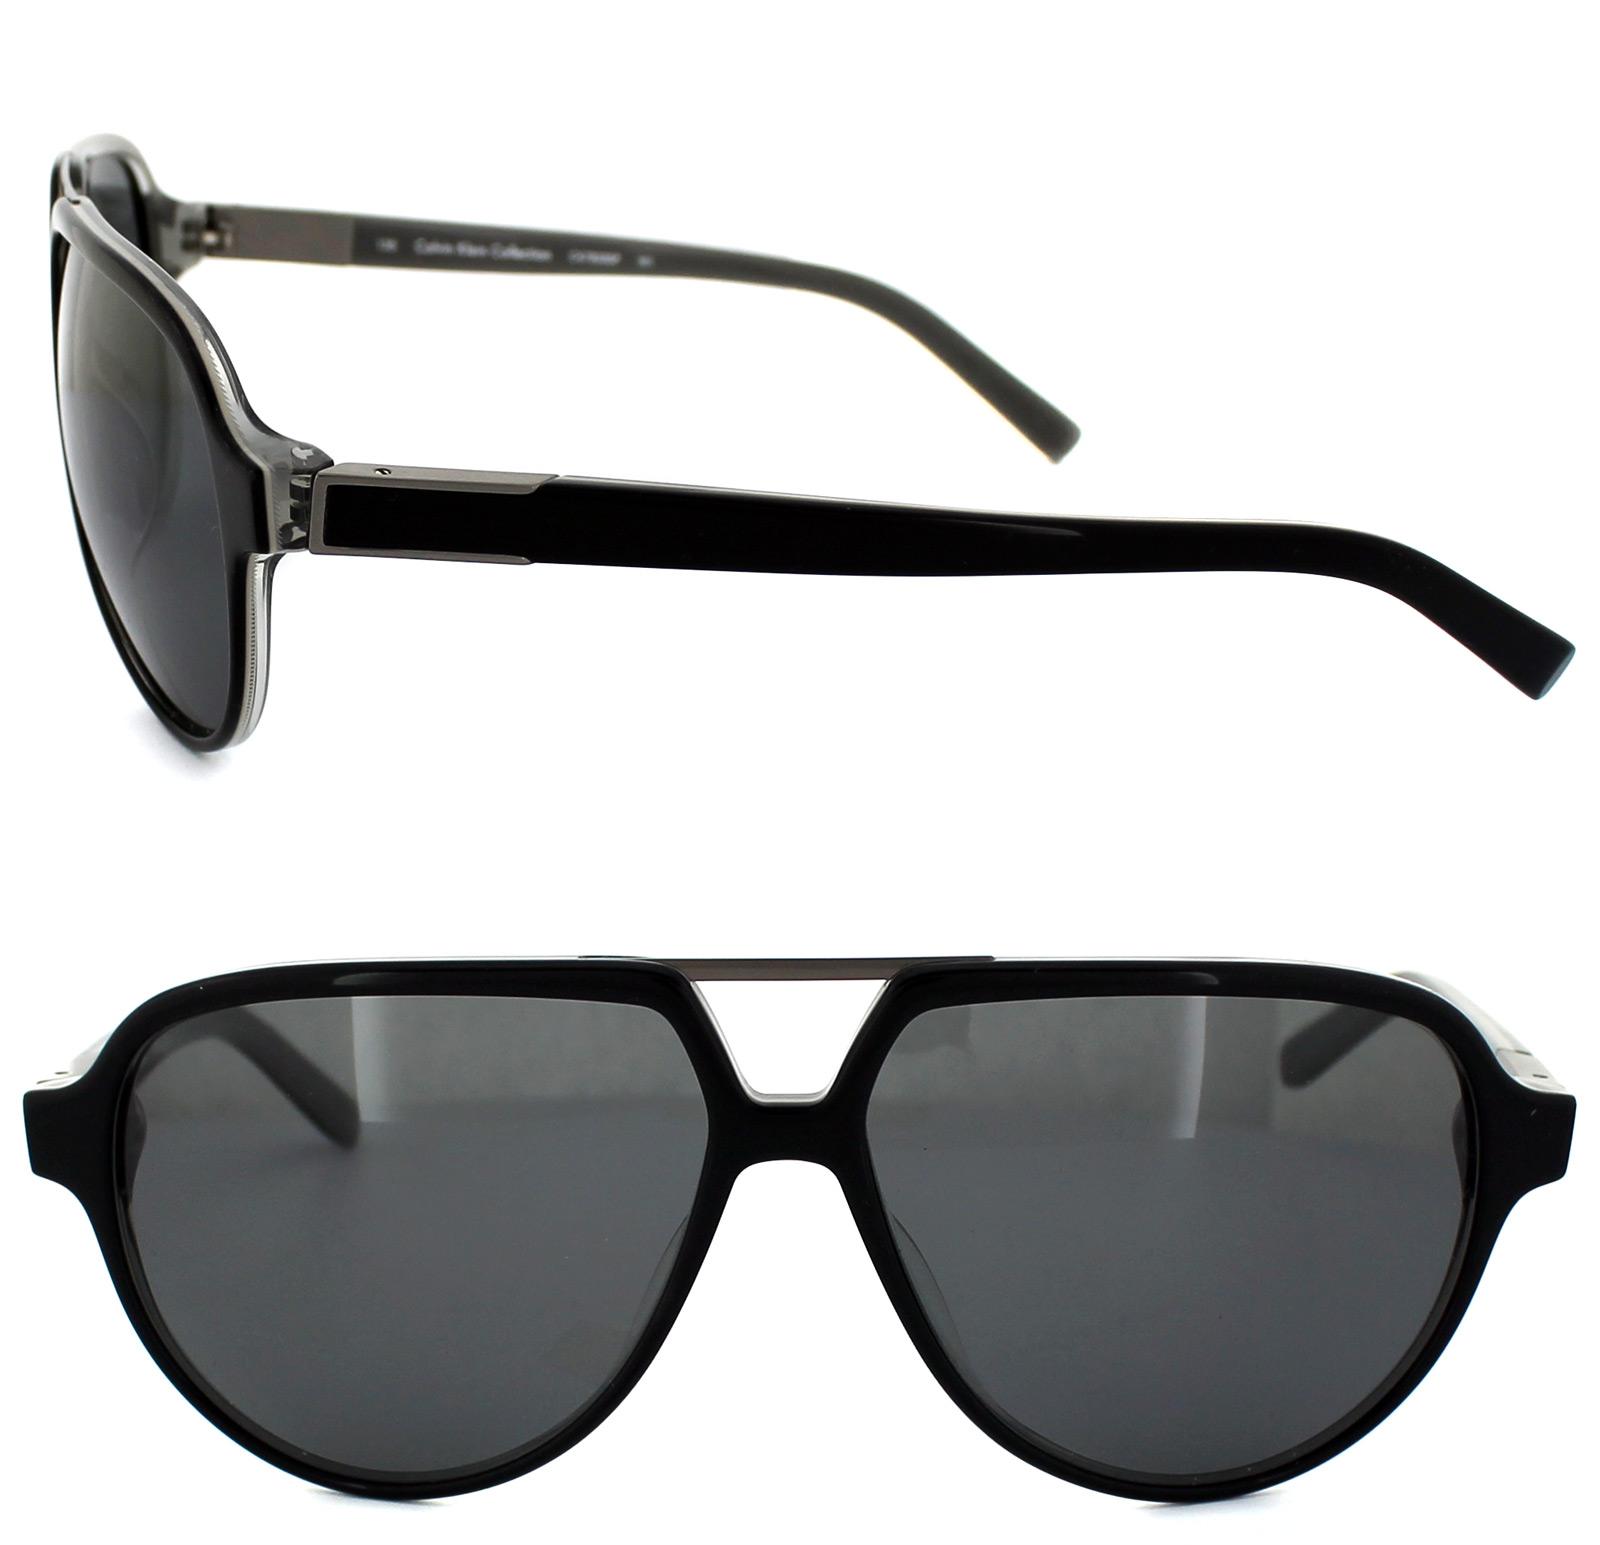 1a91e6ec3cc Calvin Klein 7858SP Sunglasses Thumbnail 1 Calvin Klein 7858SP Sunglasses  Thumbnail 2 ...